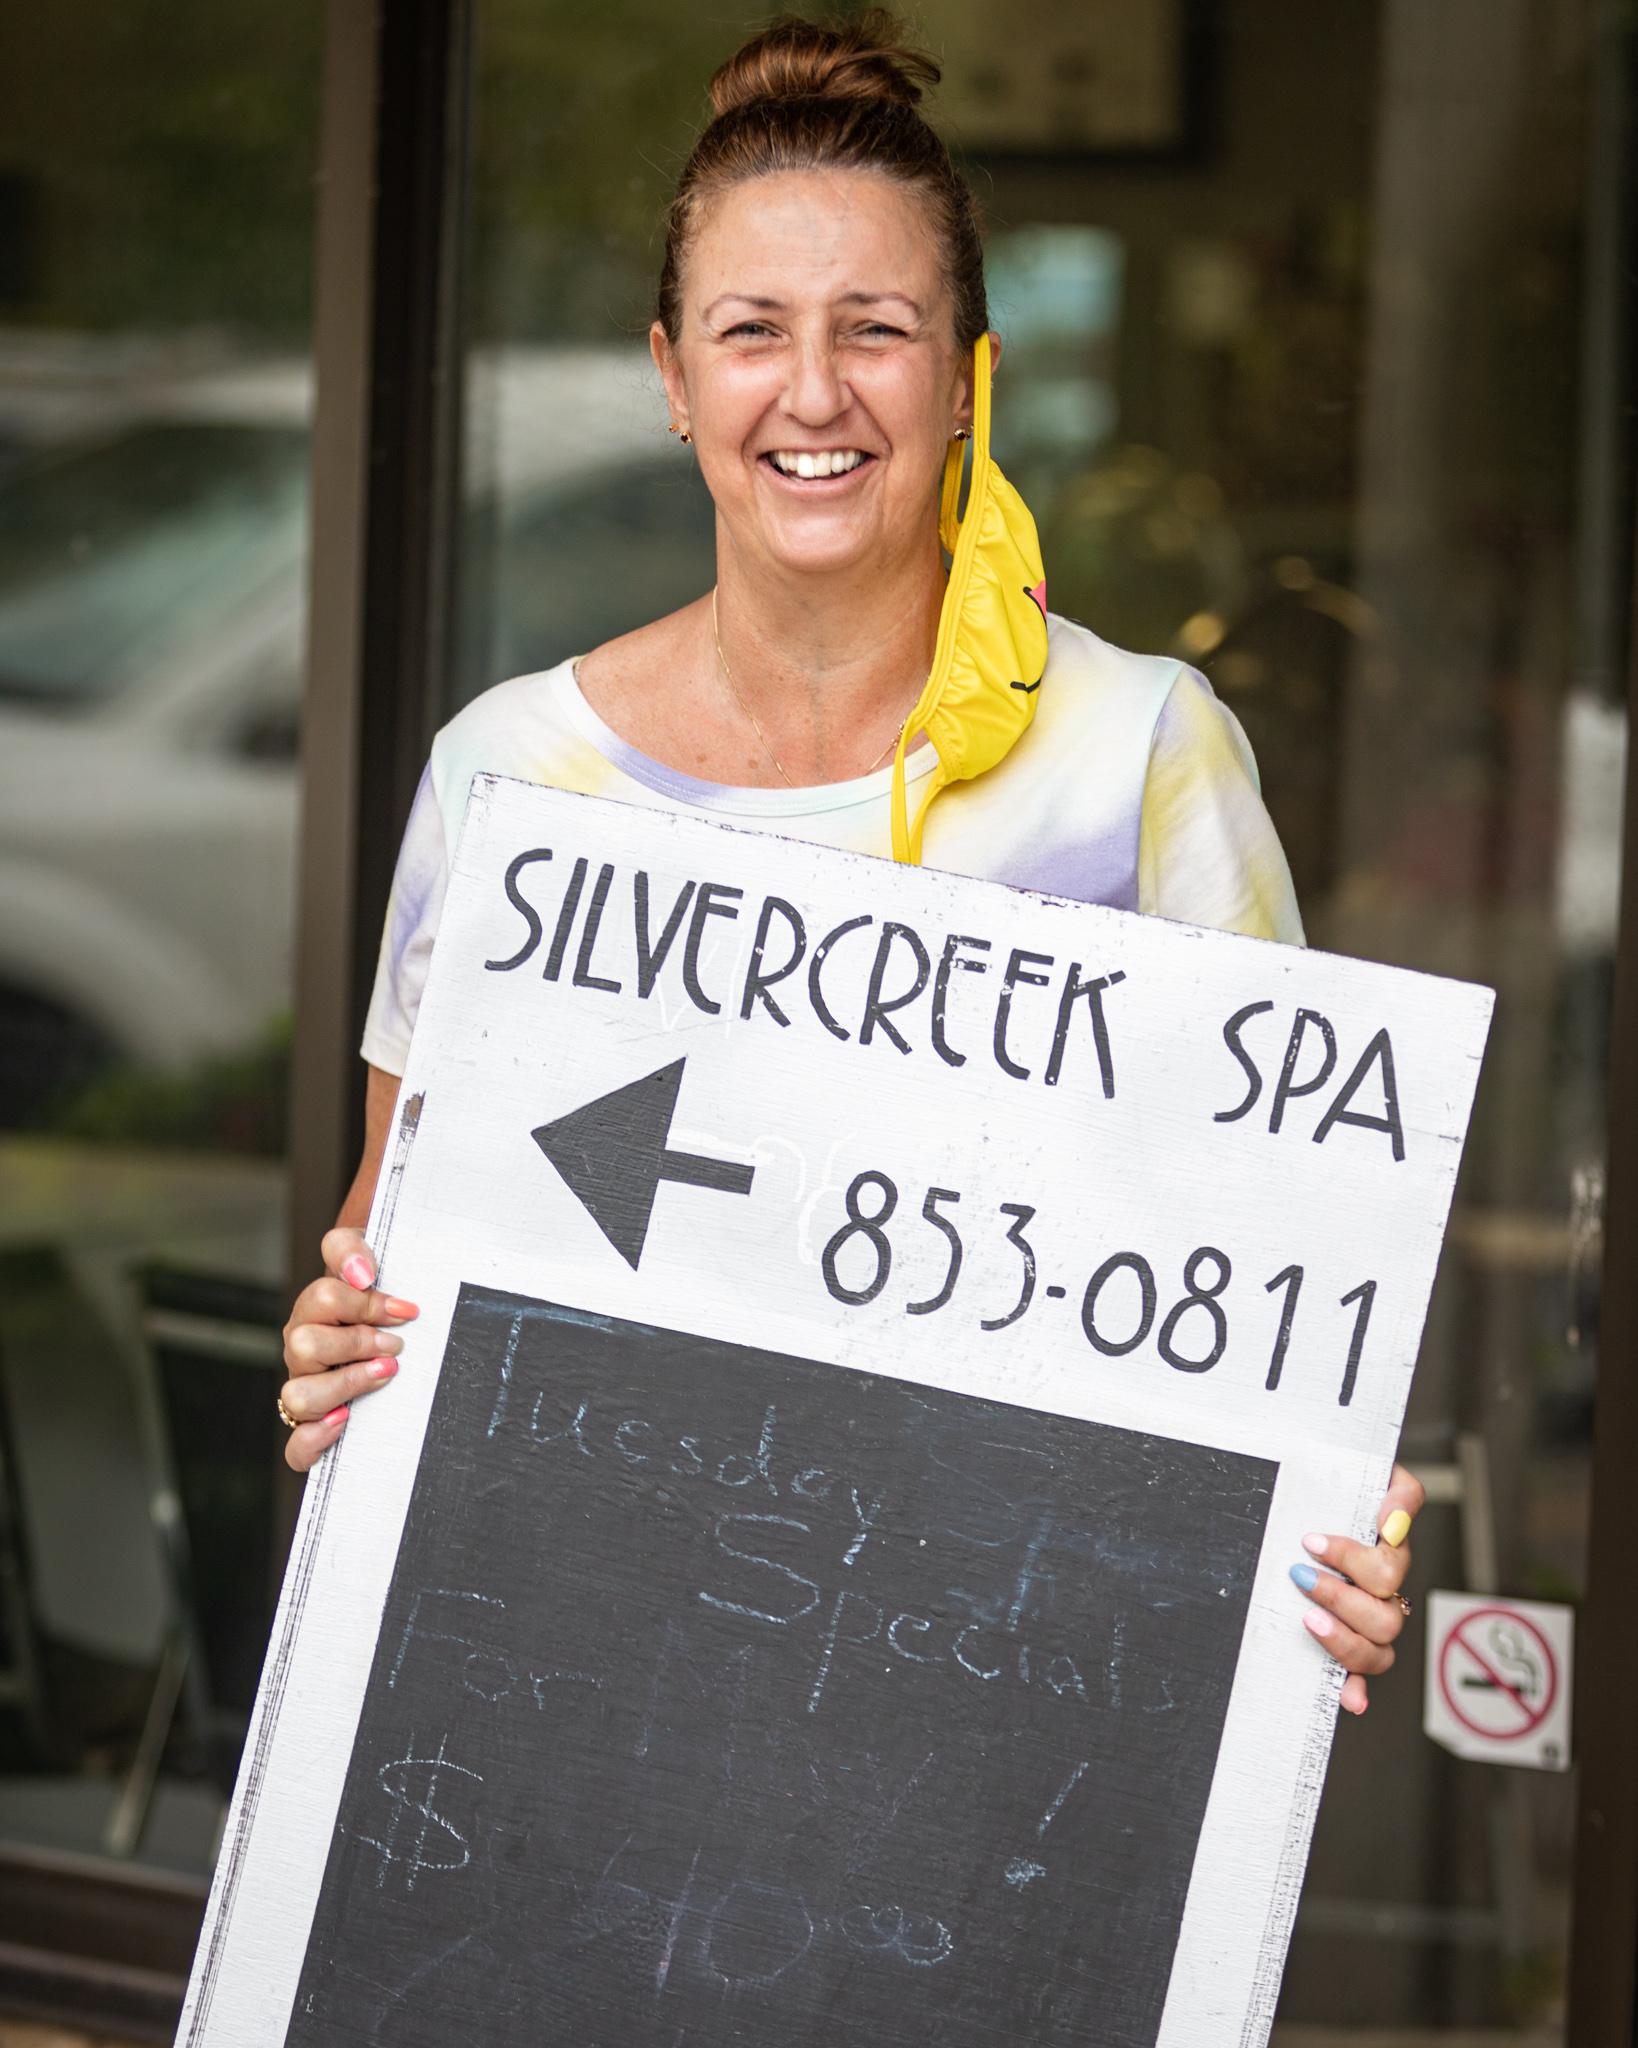 Meet the Business Owner – Silvercreek Spa